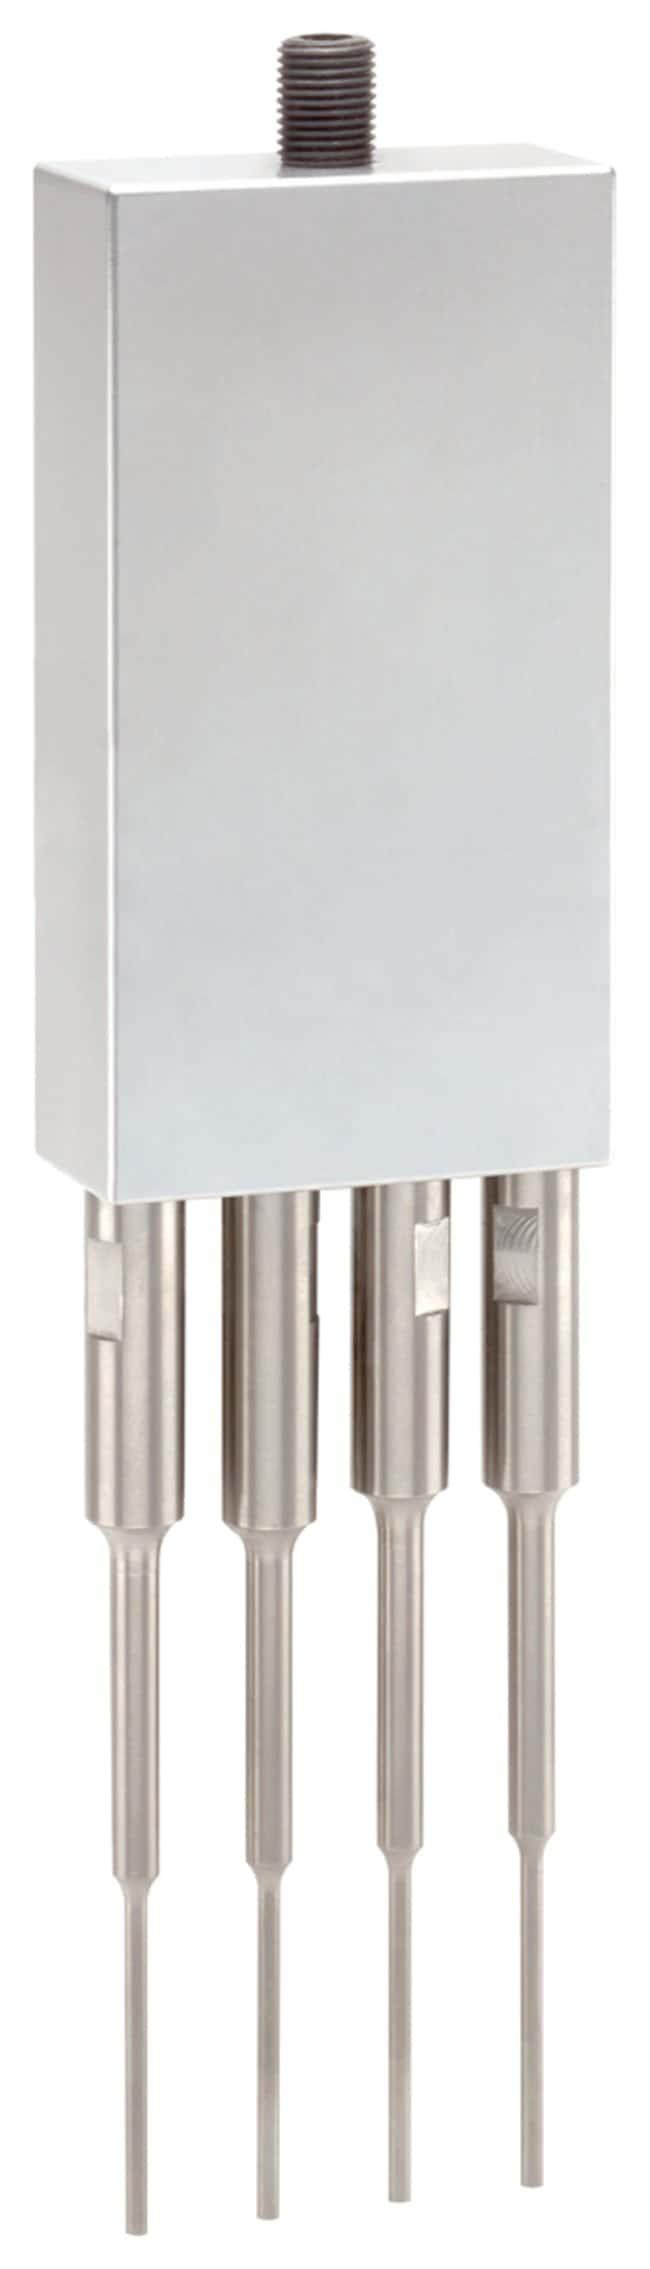 Fisher Scientific™ Eight Tip Horn replacement for Sonic Dismembrator Replacement eight tip horn; for Fisher Scientific Sonic Dismembrators Ultrasonic Homogeniser Accessories